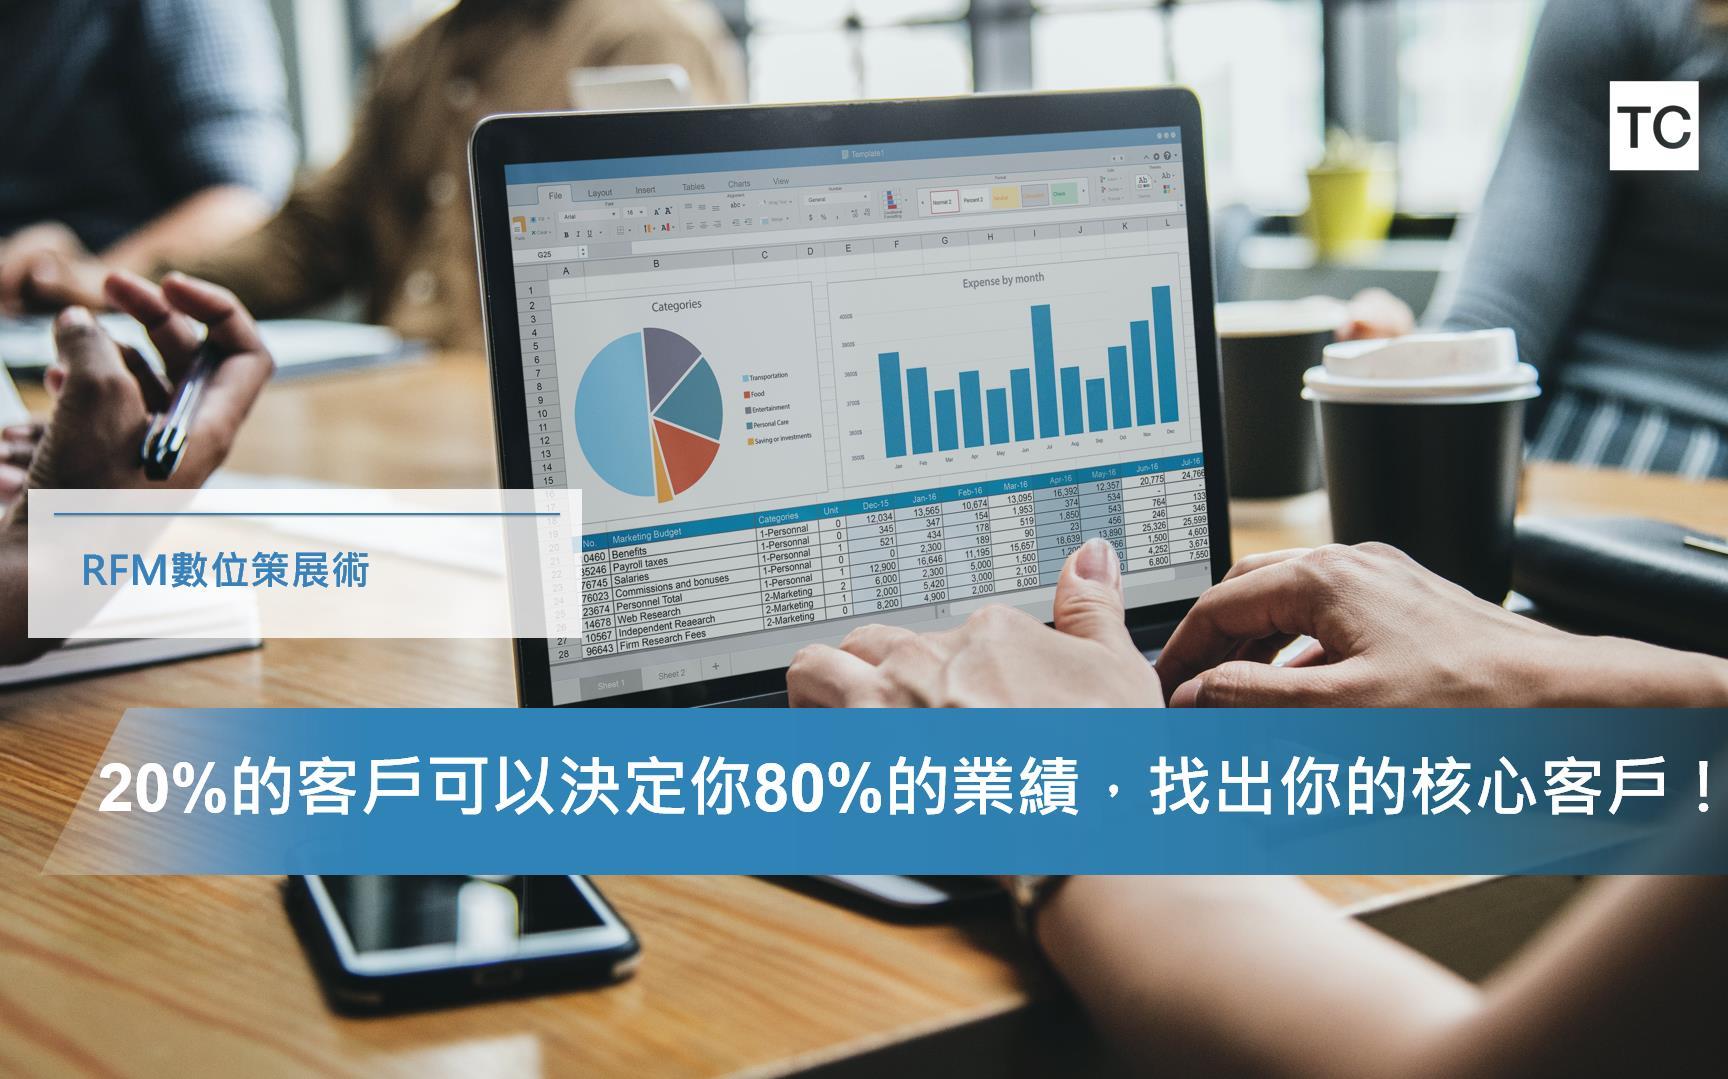 RFM數位策展術-抓住核心客戶的運營心法!20%的客戶決定80%的業績